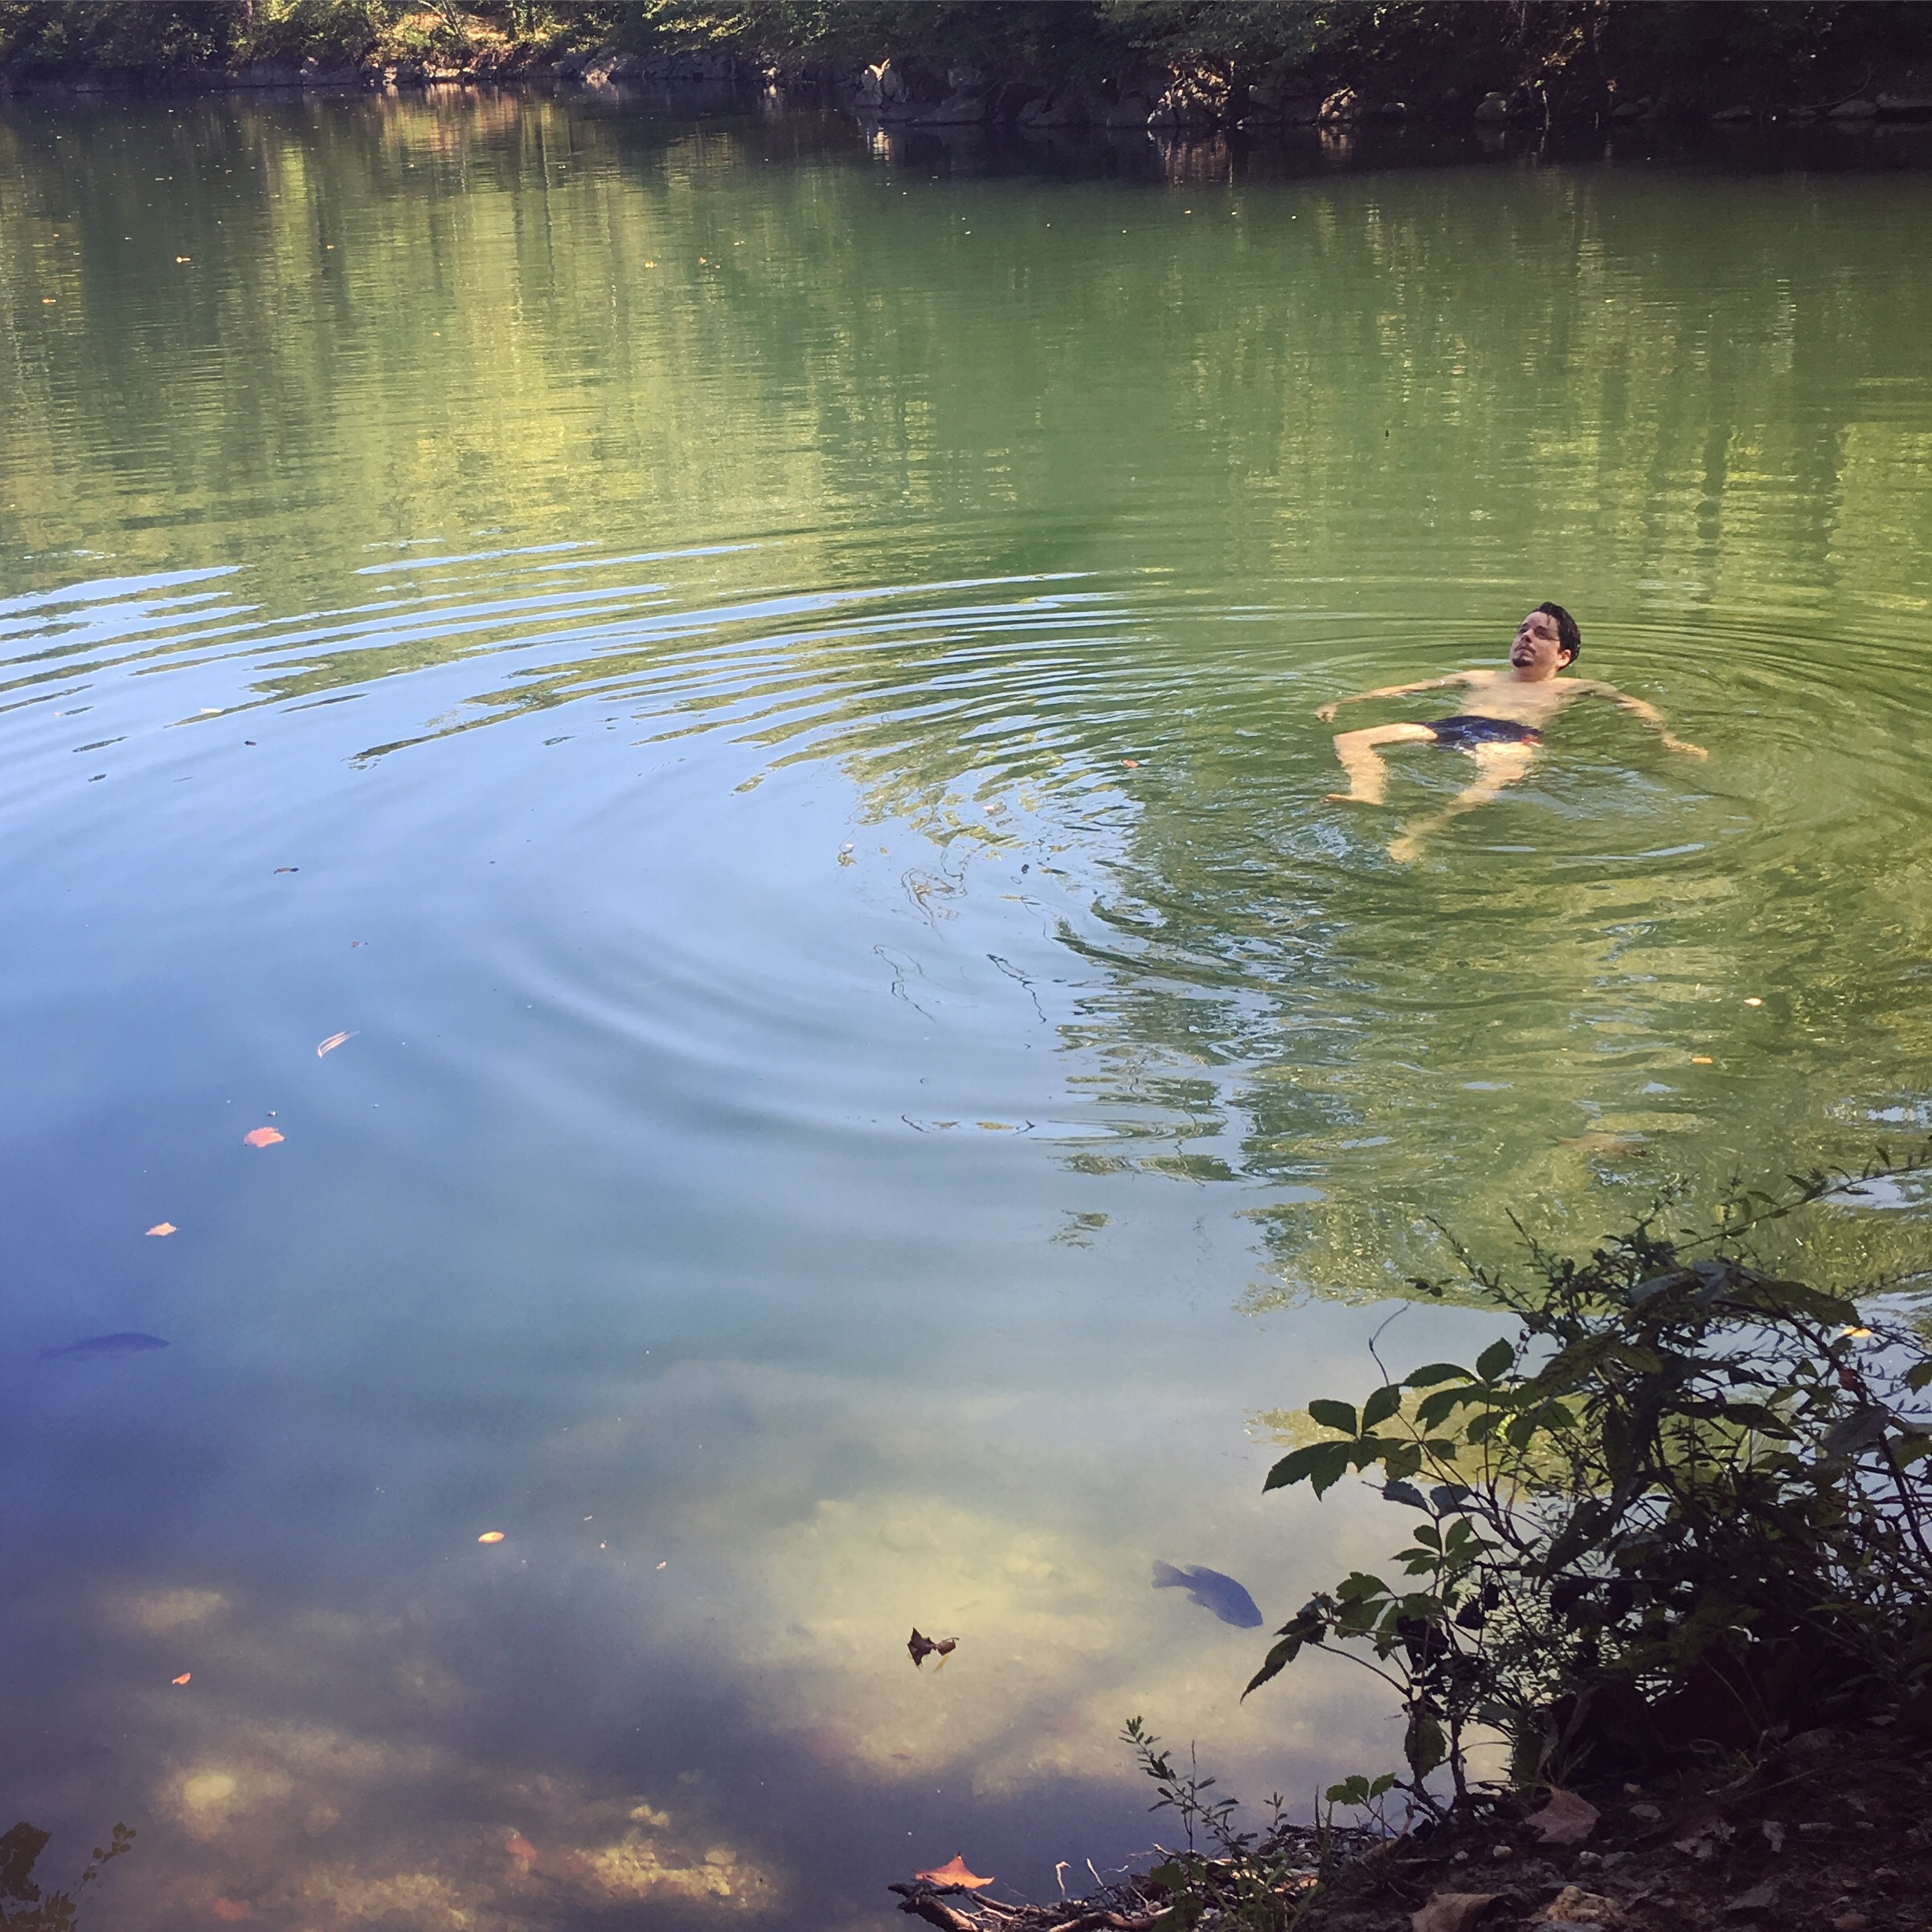 Robert enjoying a wild swim